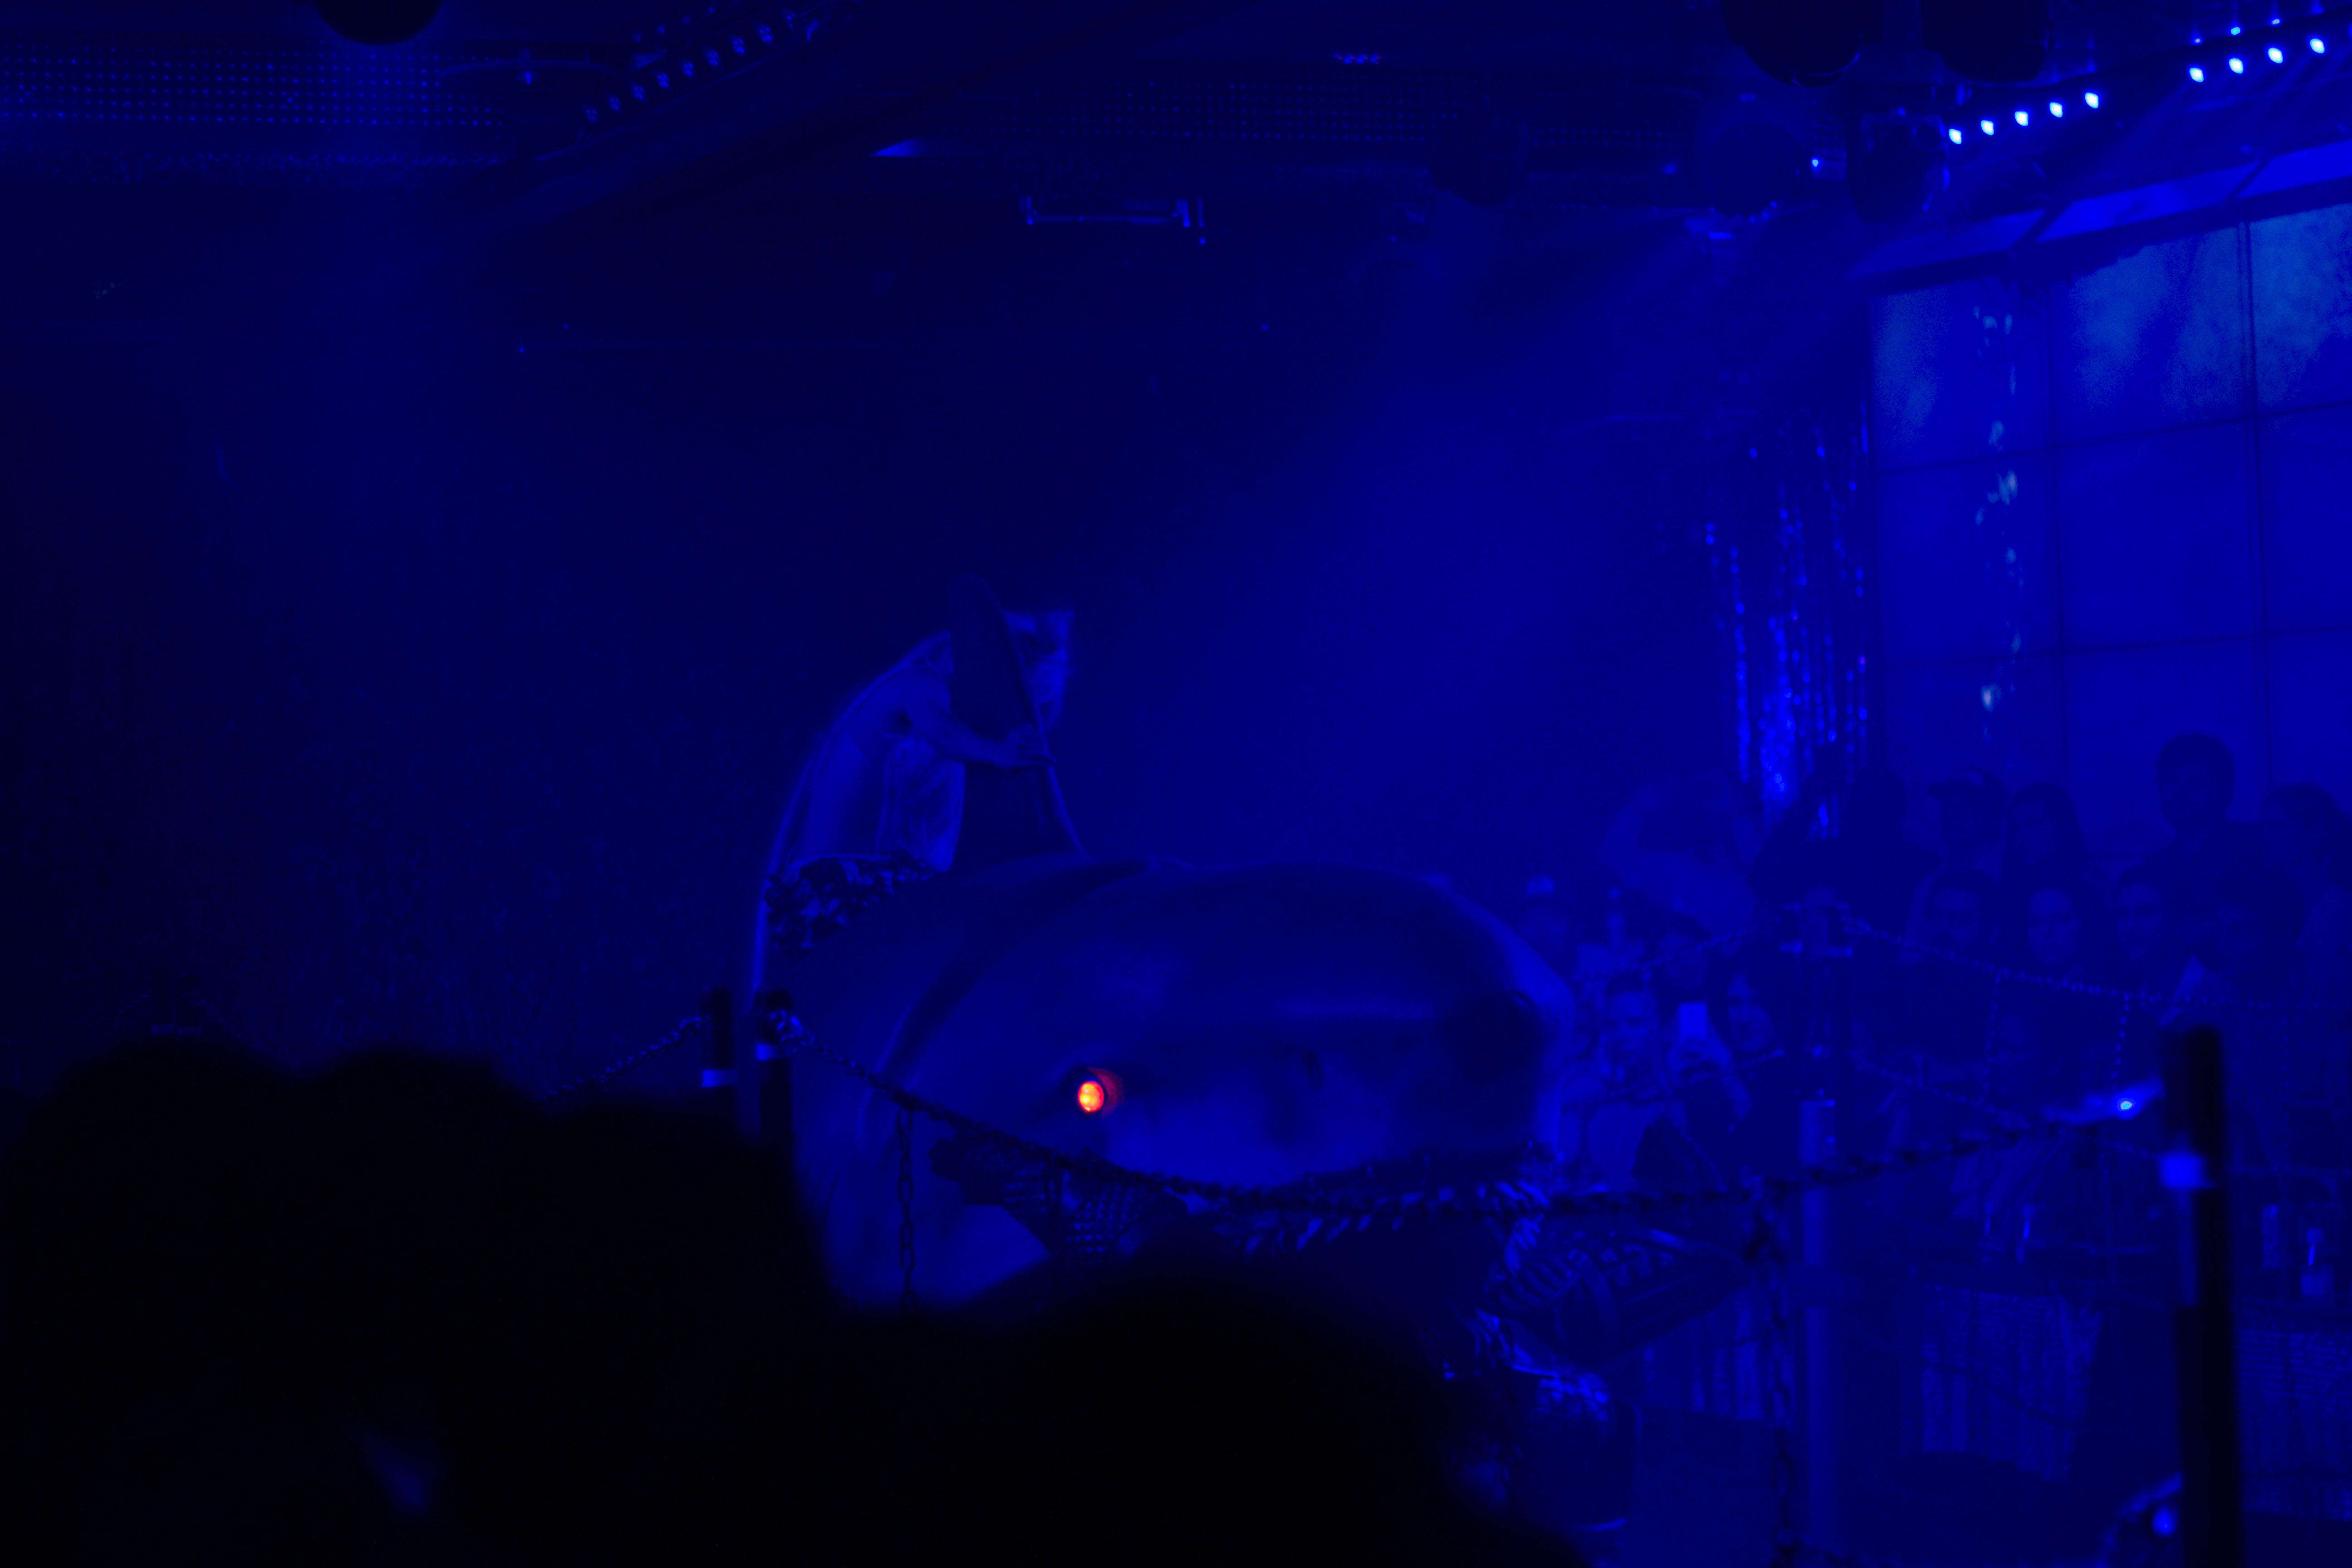 IHEARTALICE_tokyo_robotershow_03